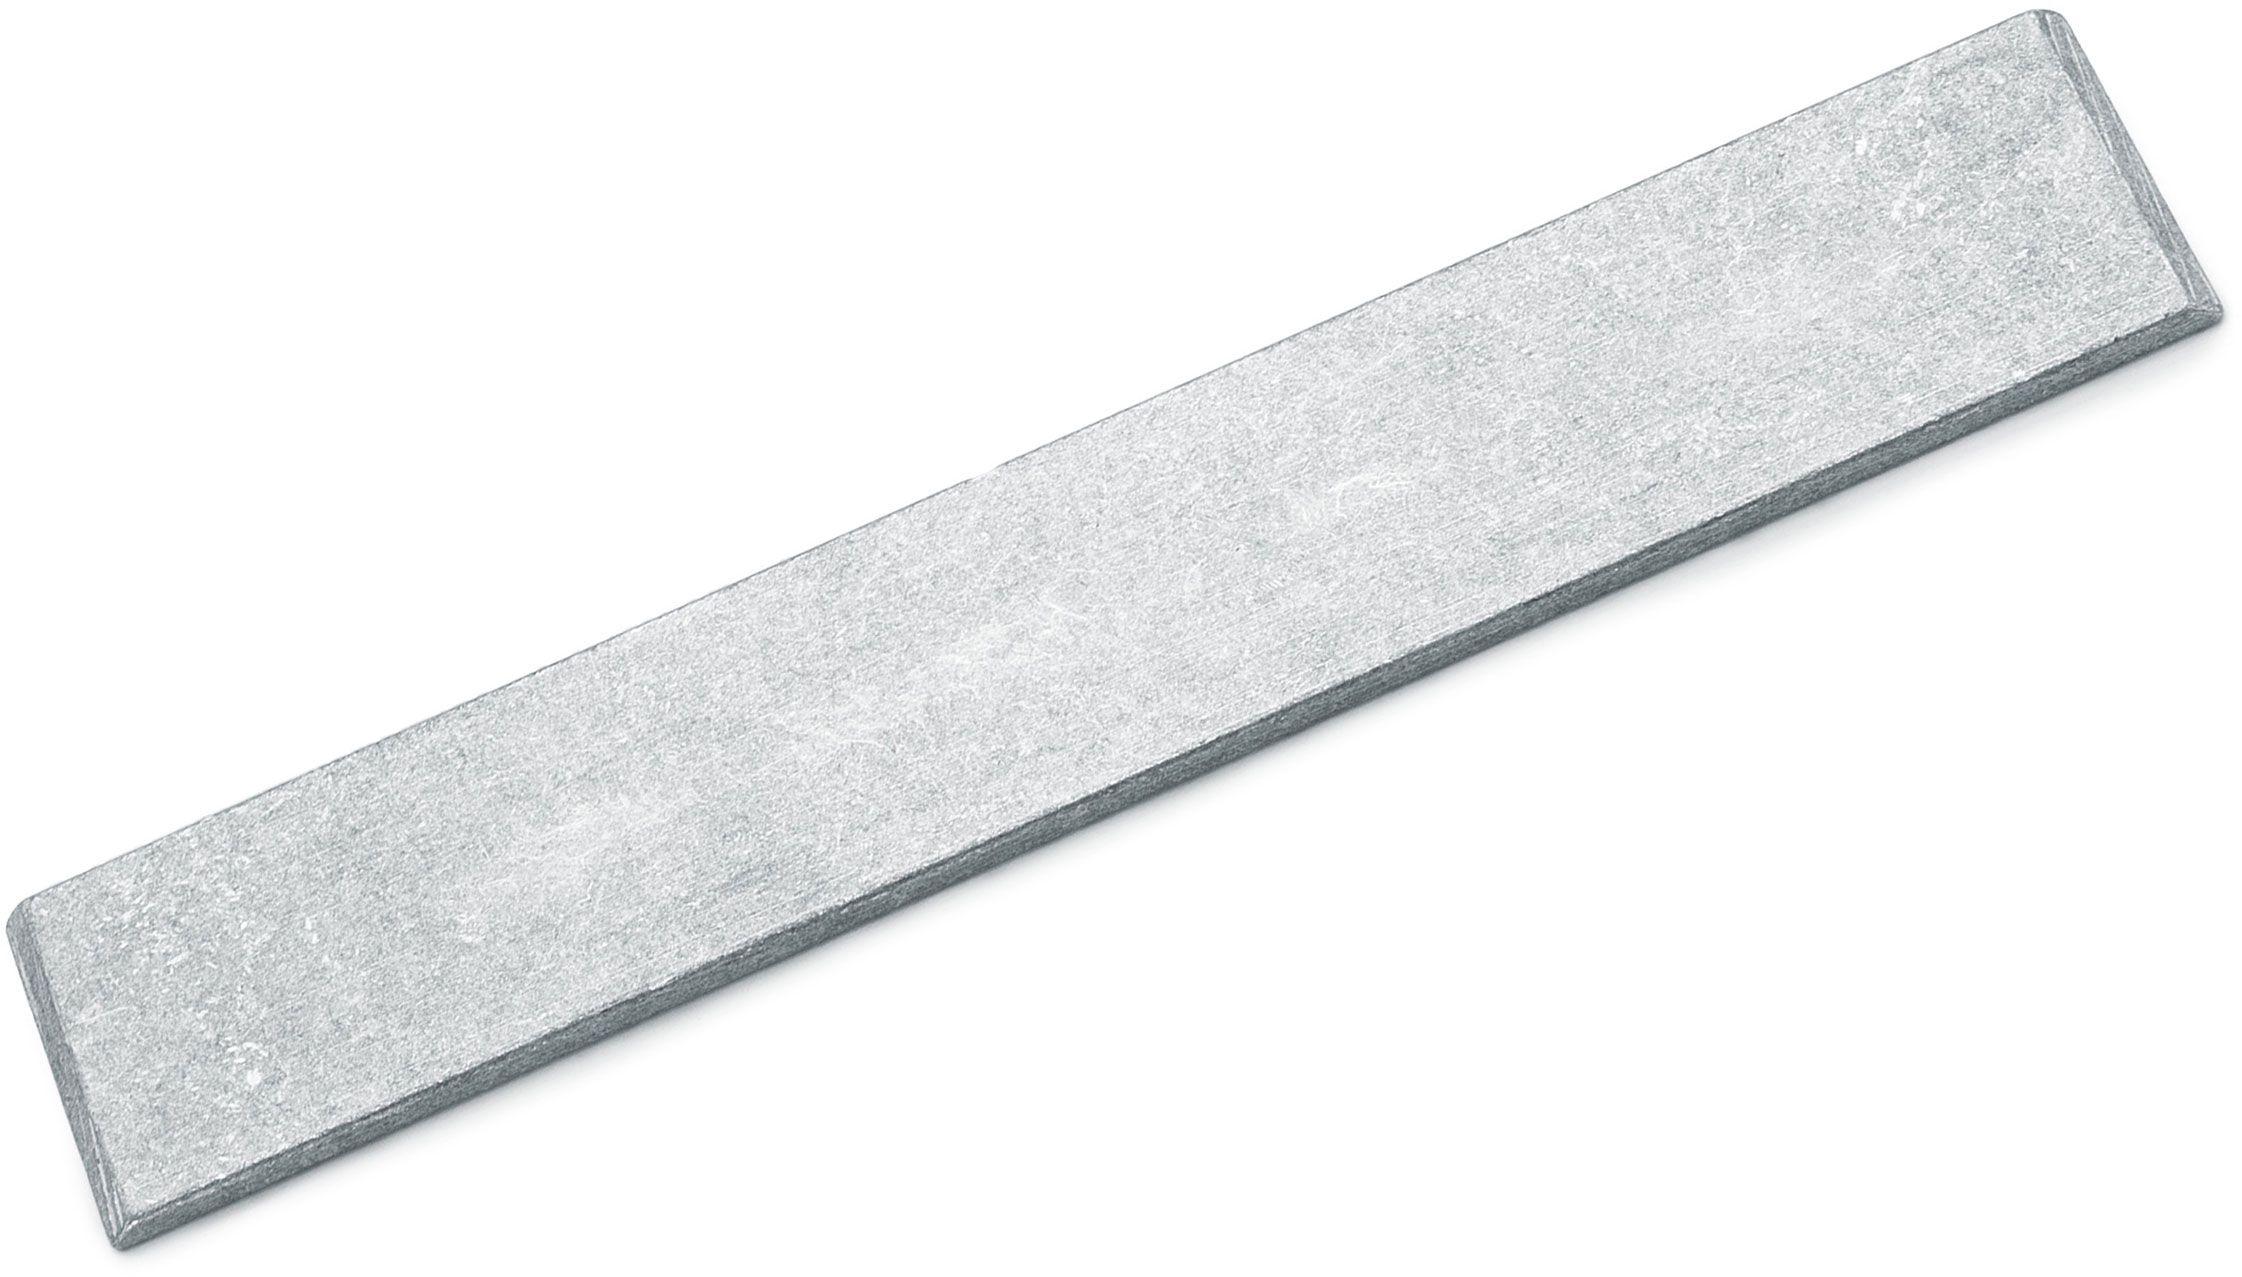 Edge Pro Sharpening Blank Stone